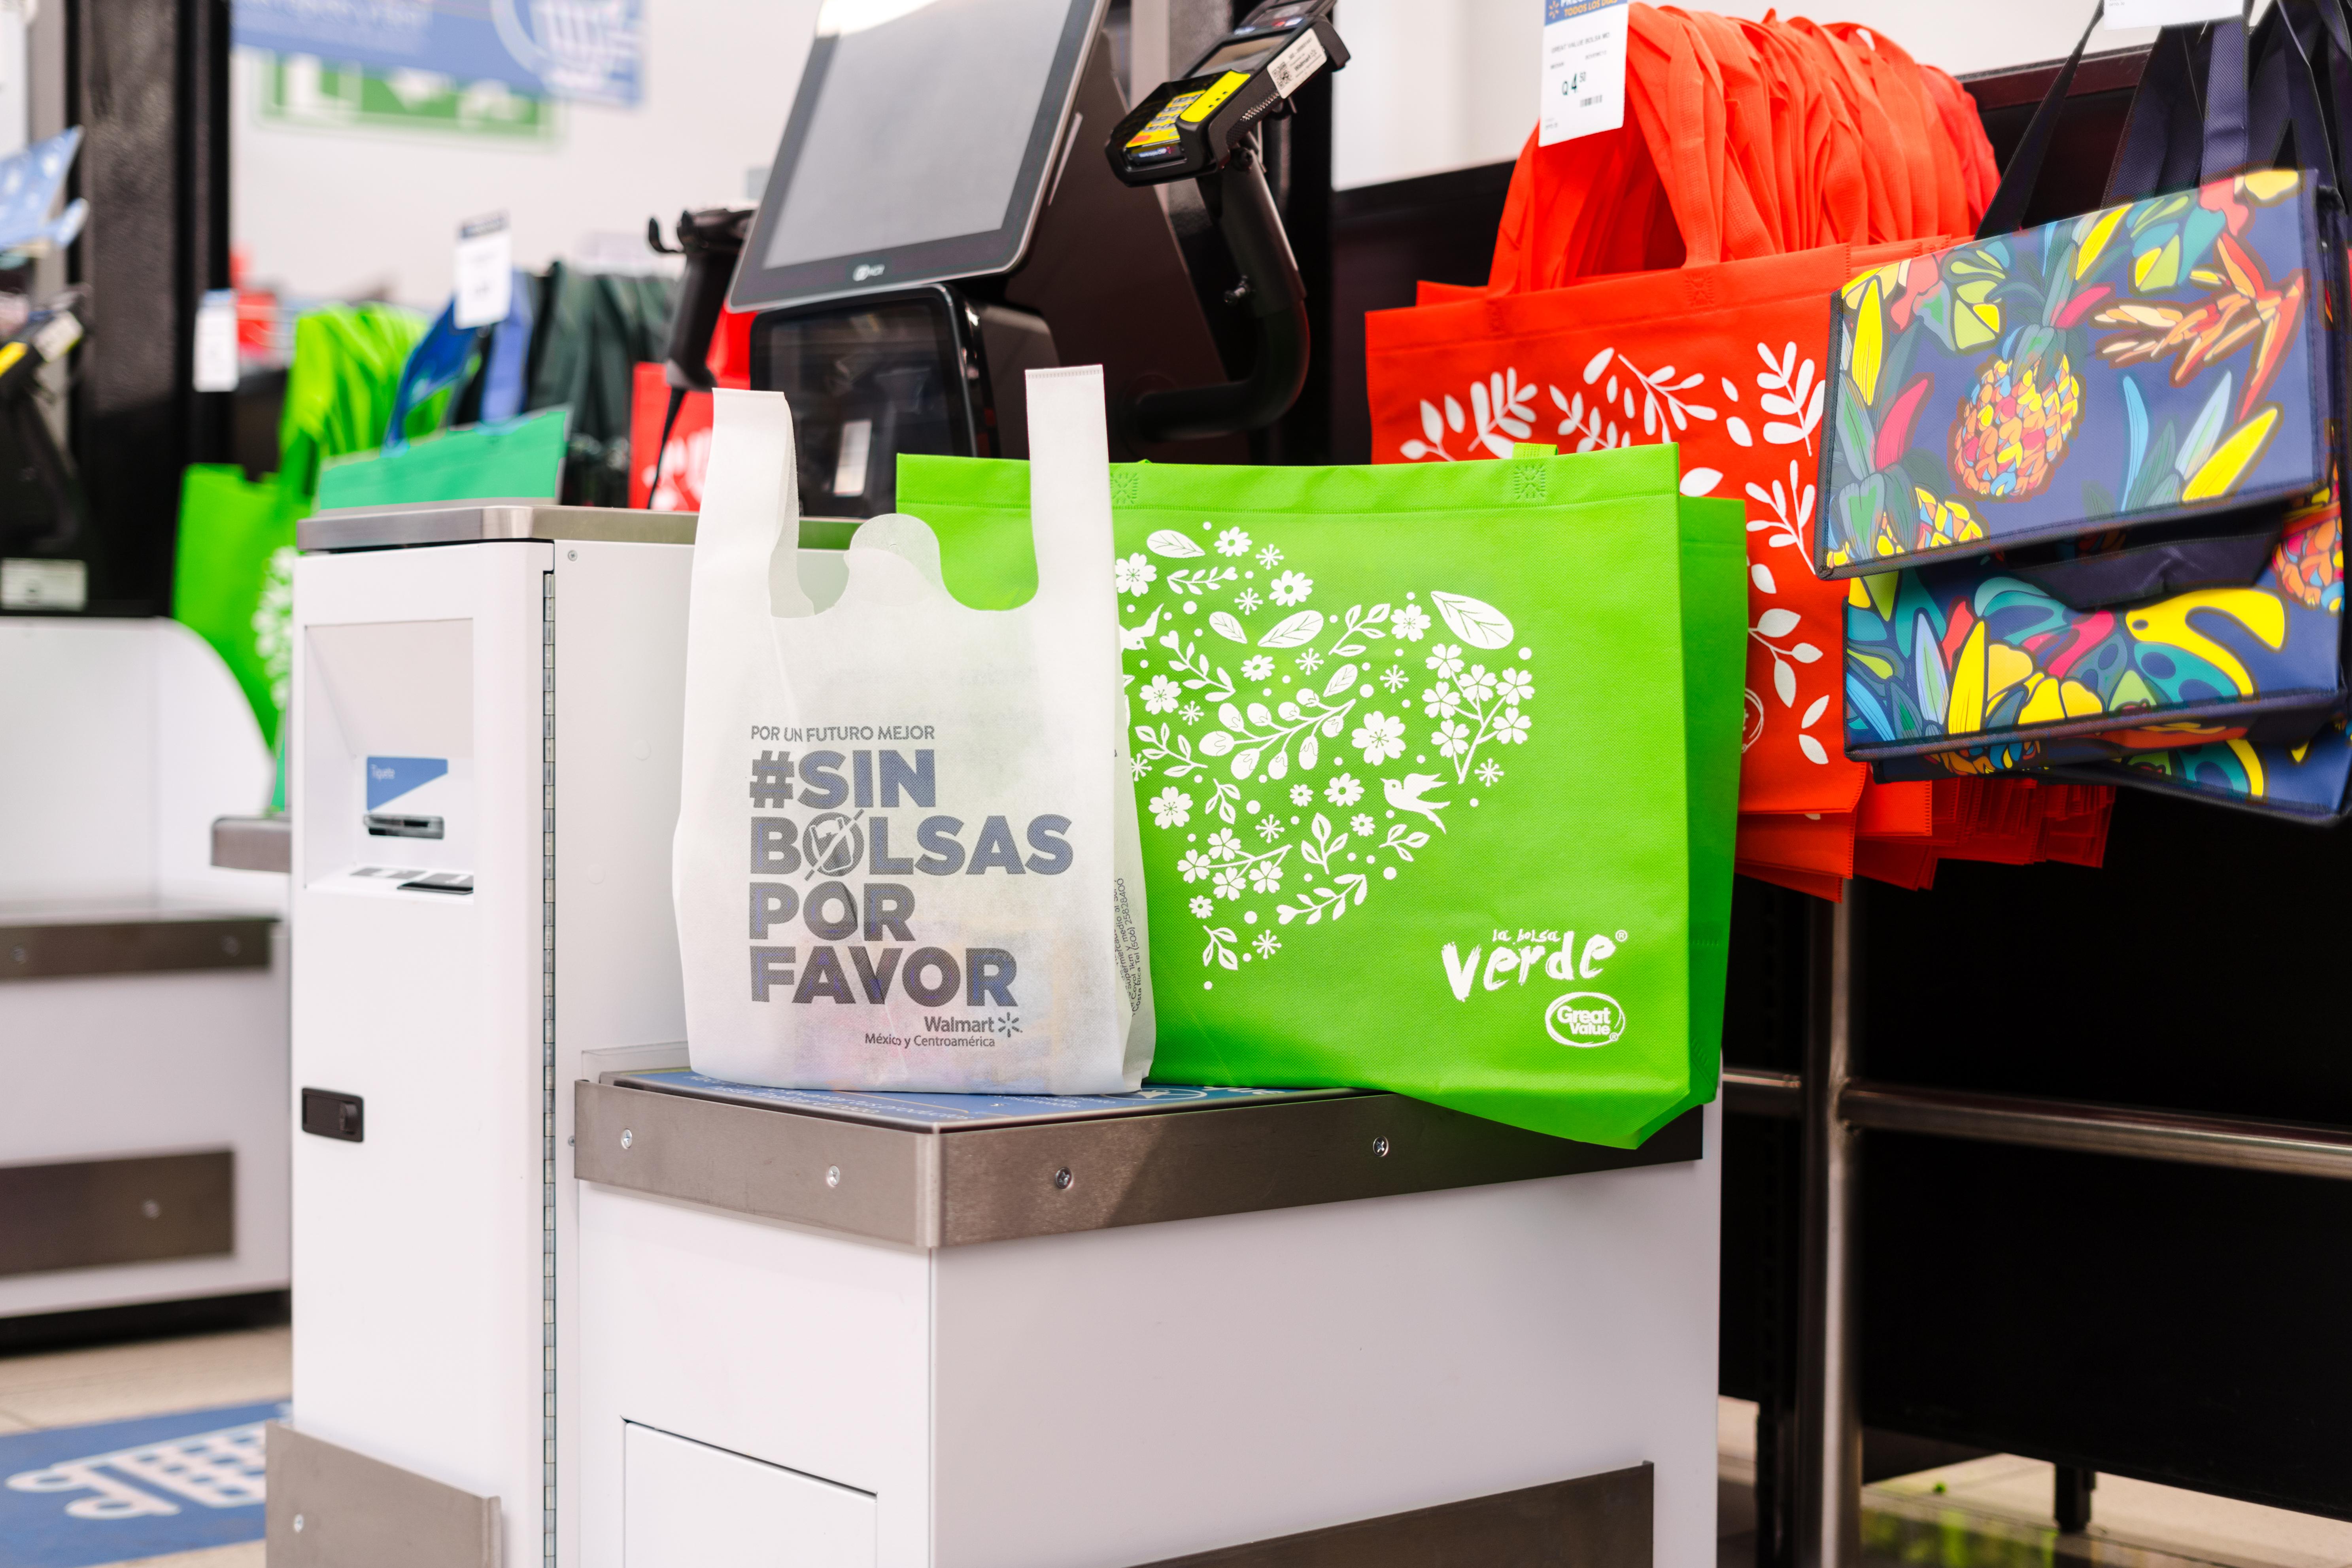 Walmart elimina bolsas plásticas de un solo uso en Honduras